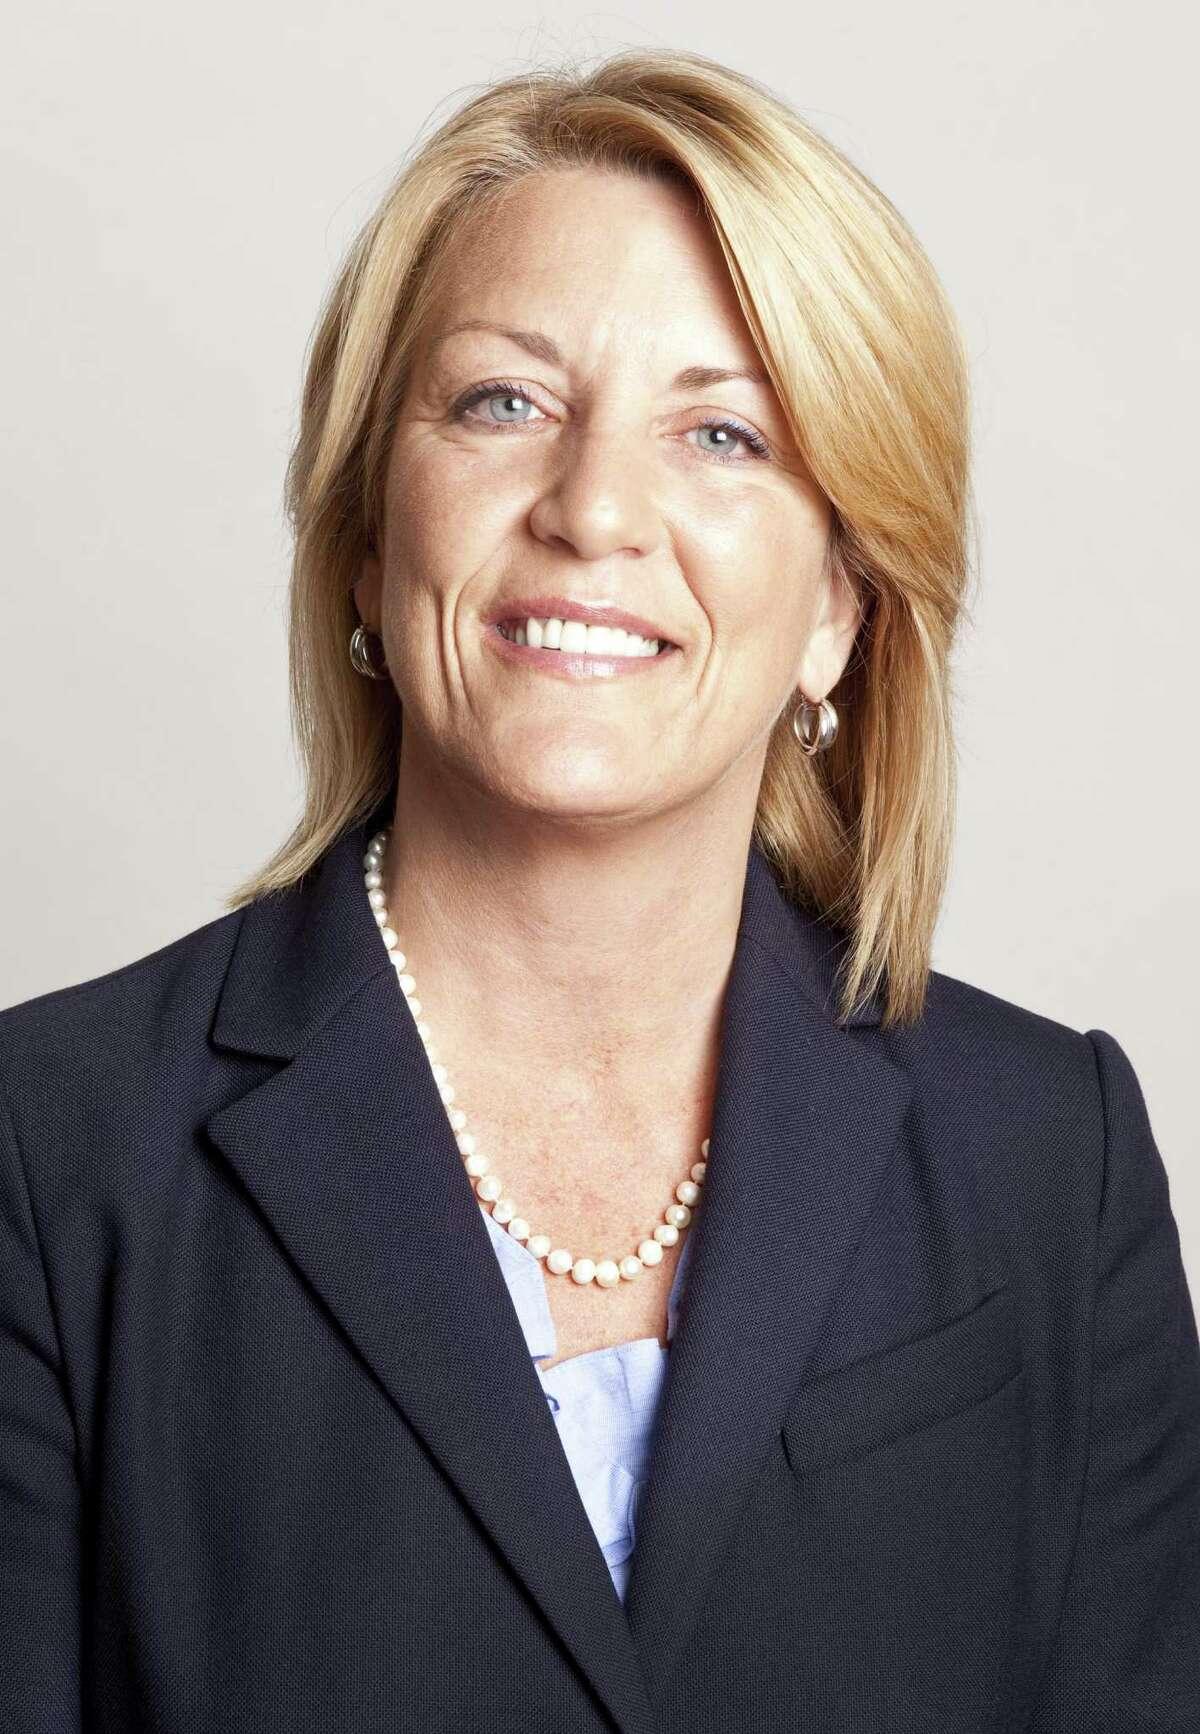 State Rep Brenda Kupchick